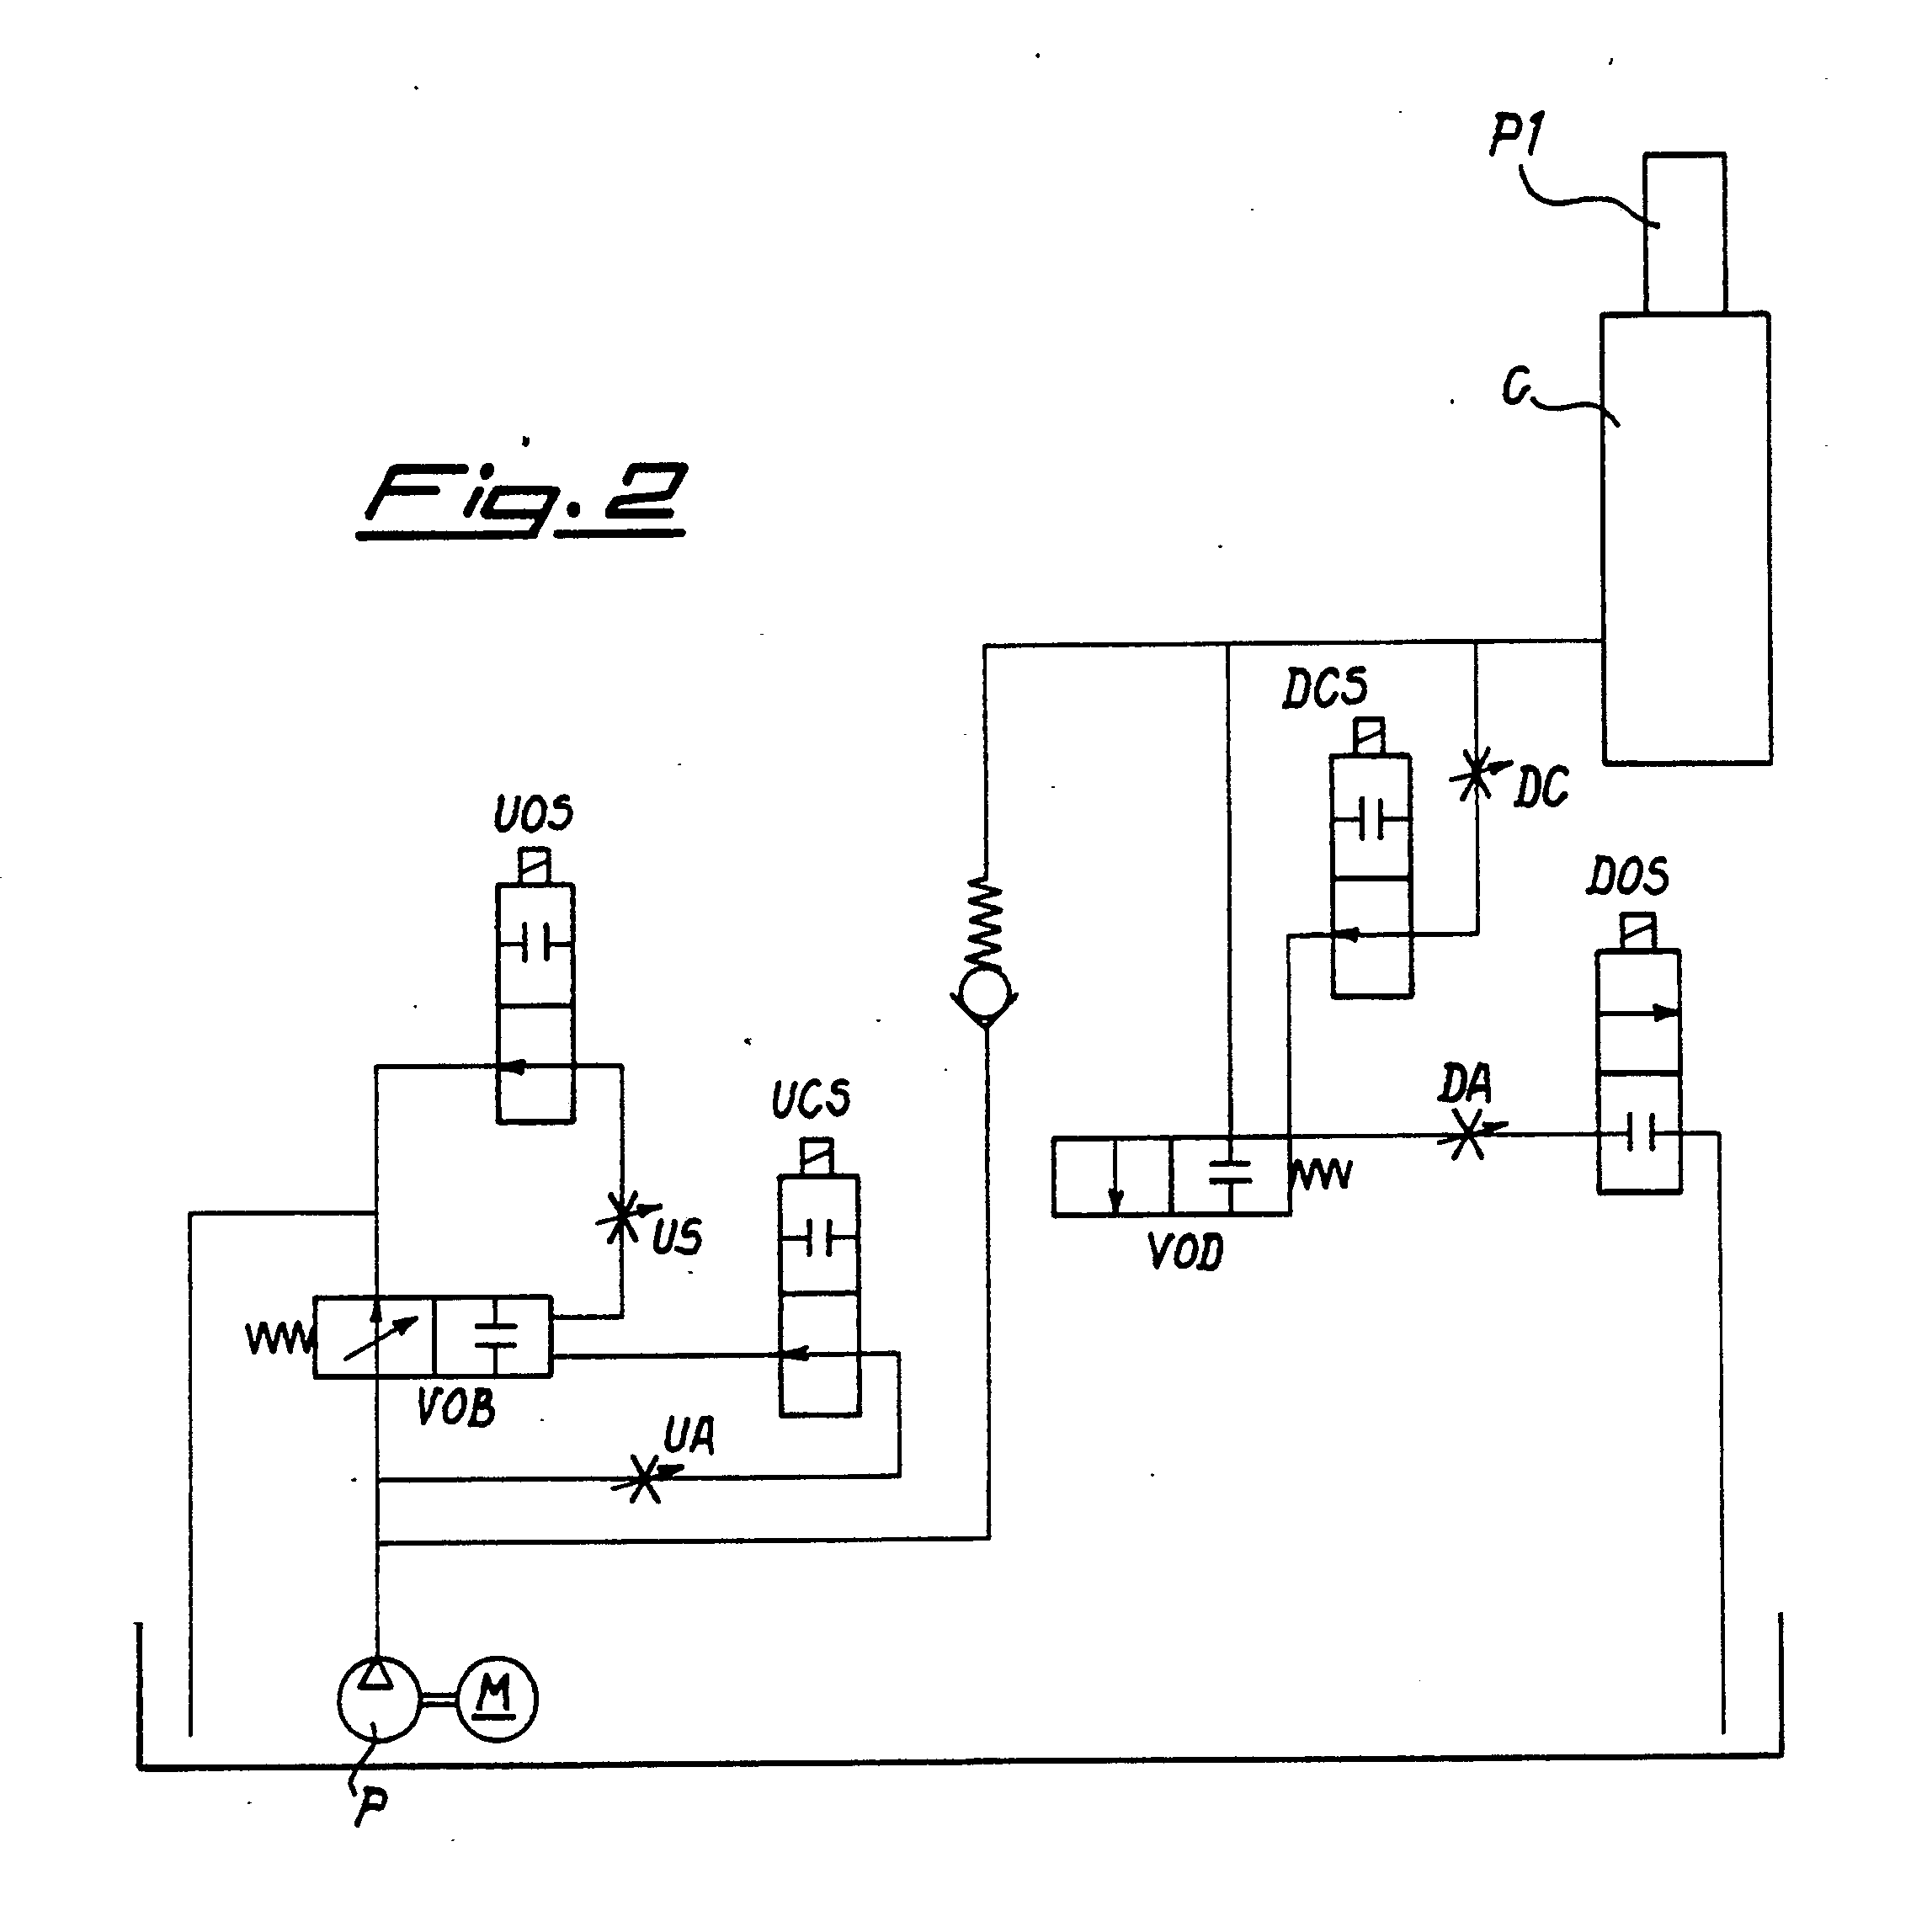 Hydraulic Elevator Wiring Diagram - 2004 Dodge Ram 3500 Fuse Diagram -  maxoncb.tukune.jeanjaures37.fr | Hydraulic Elevator Wiring Diagram |  | Wiring Diagram Resource